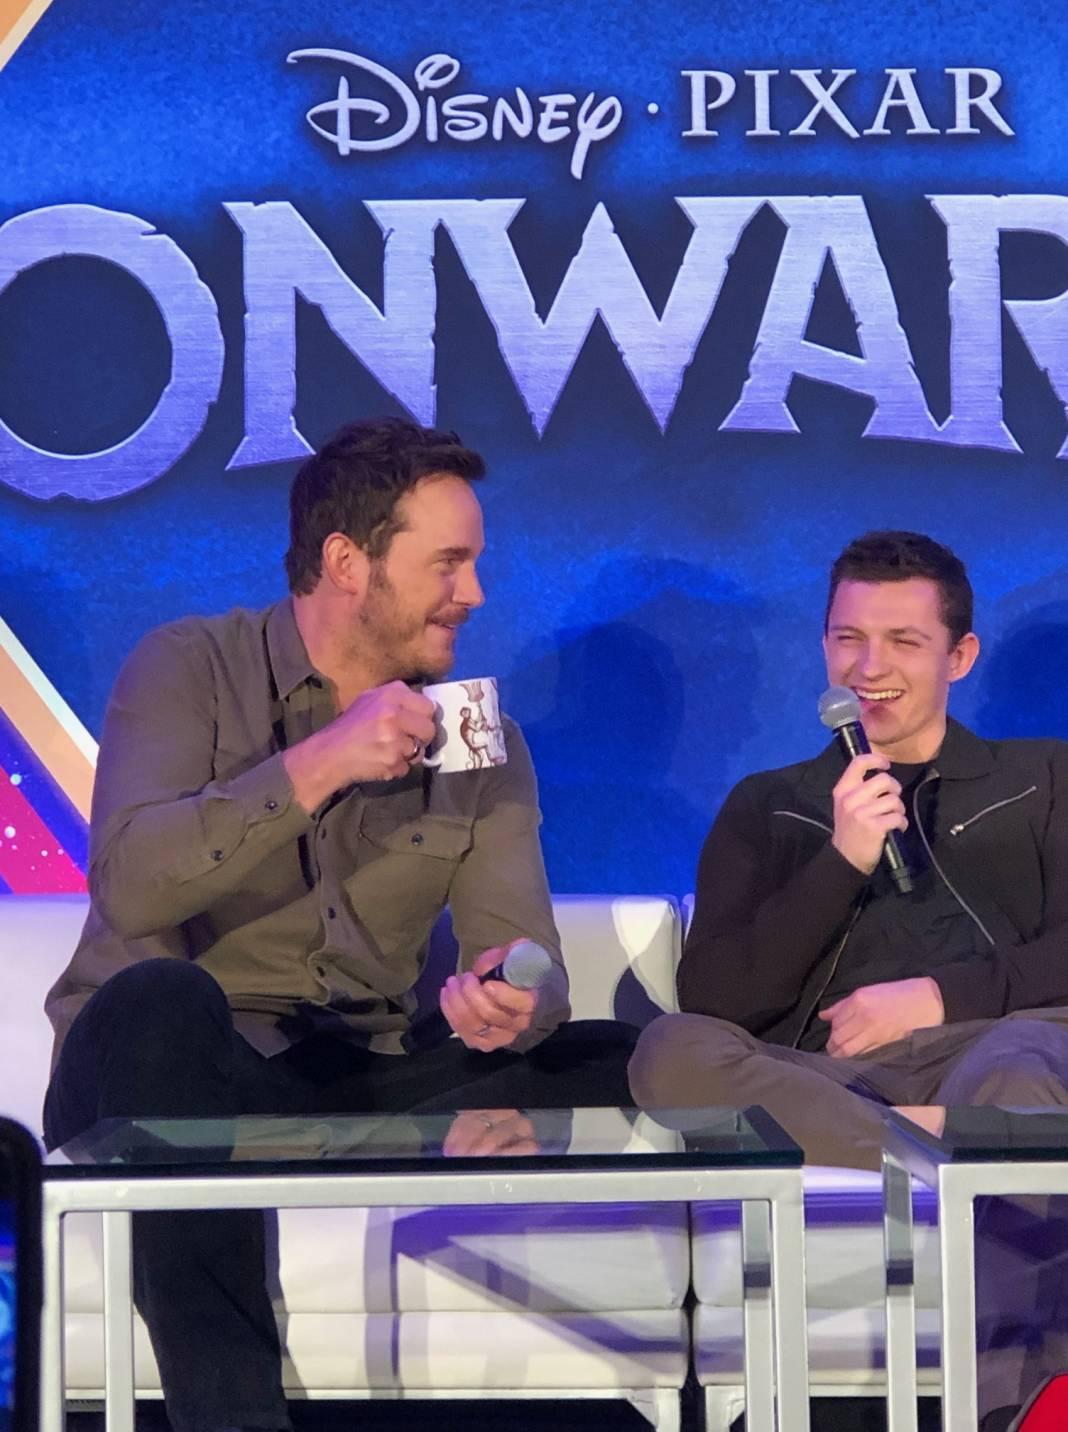 Onward Press Conference: Chris Pratt, Tom Holland on the Pixar Film